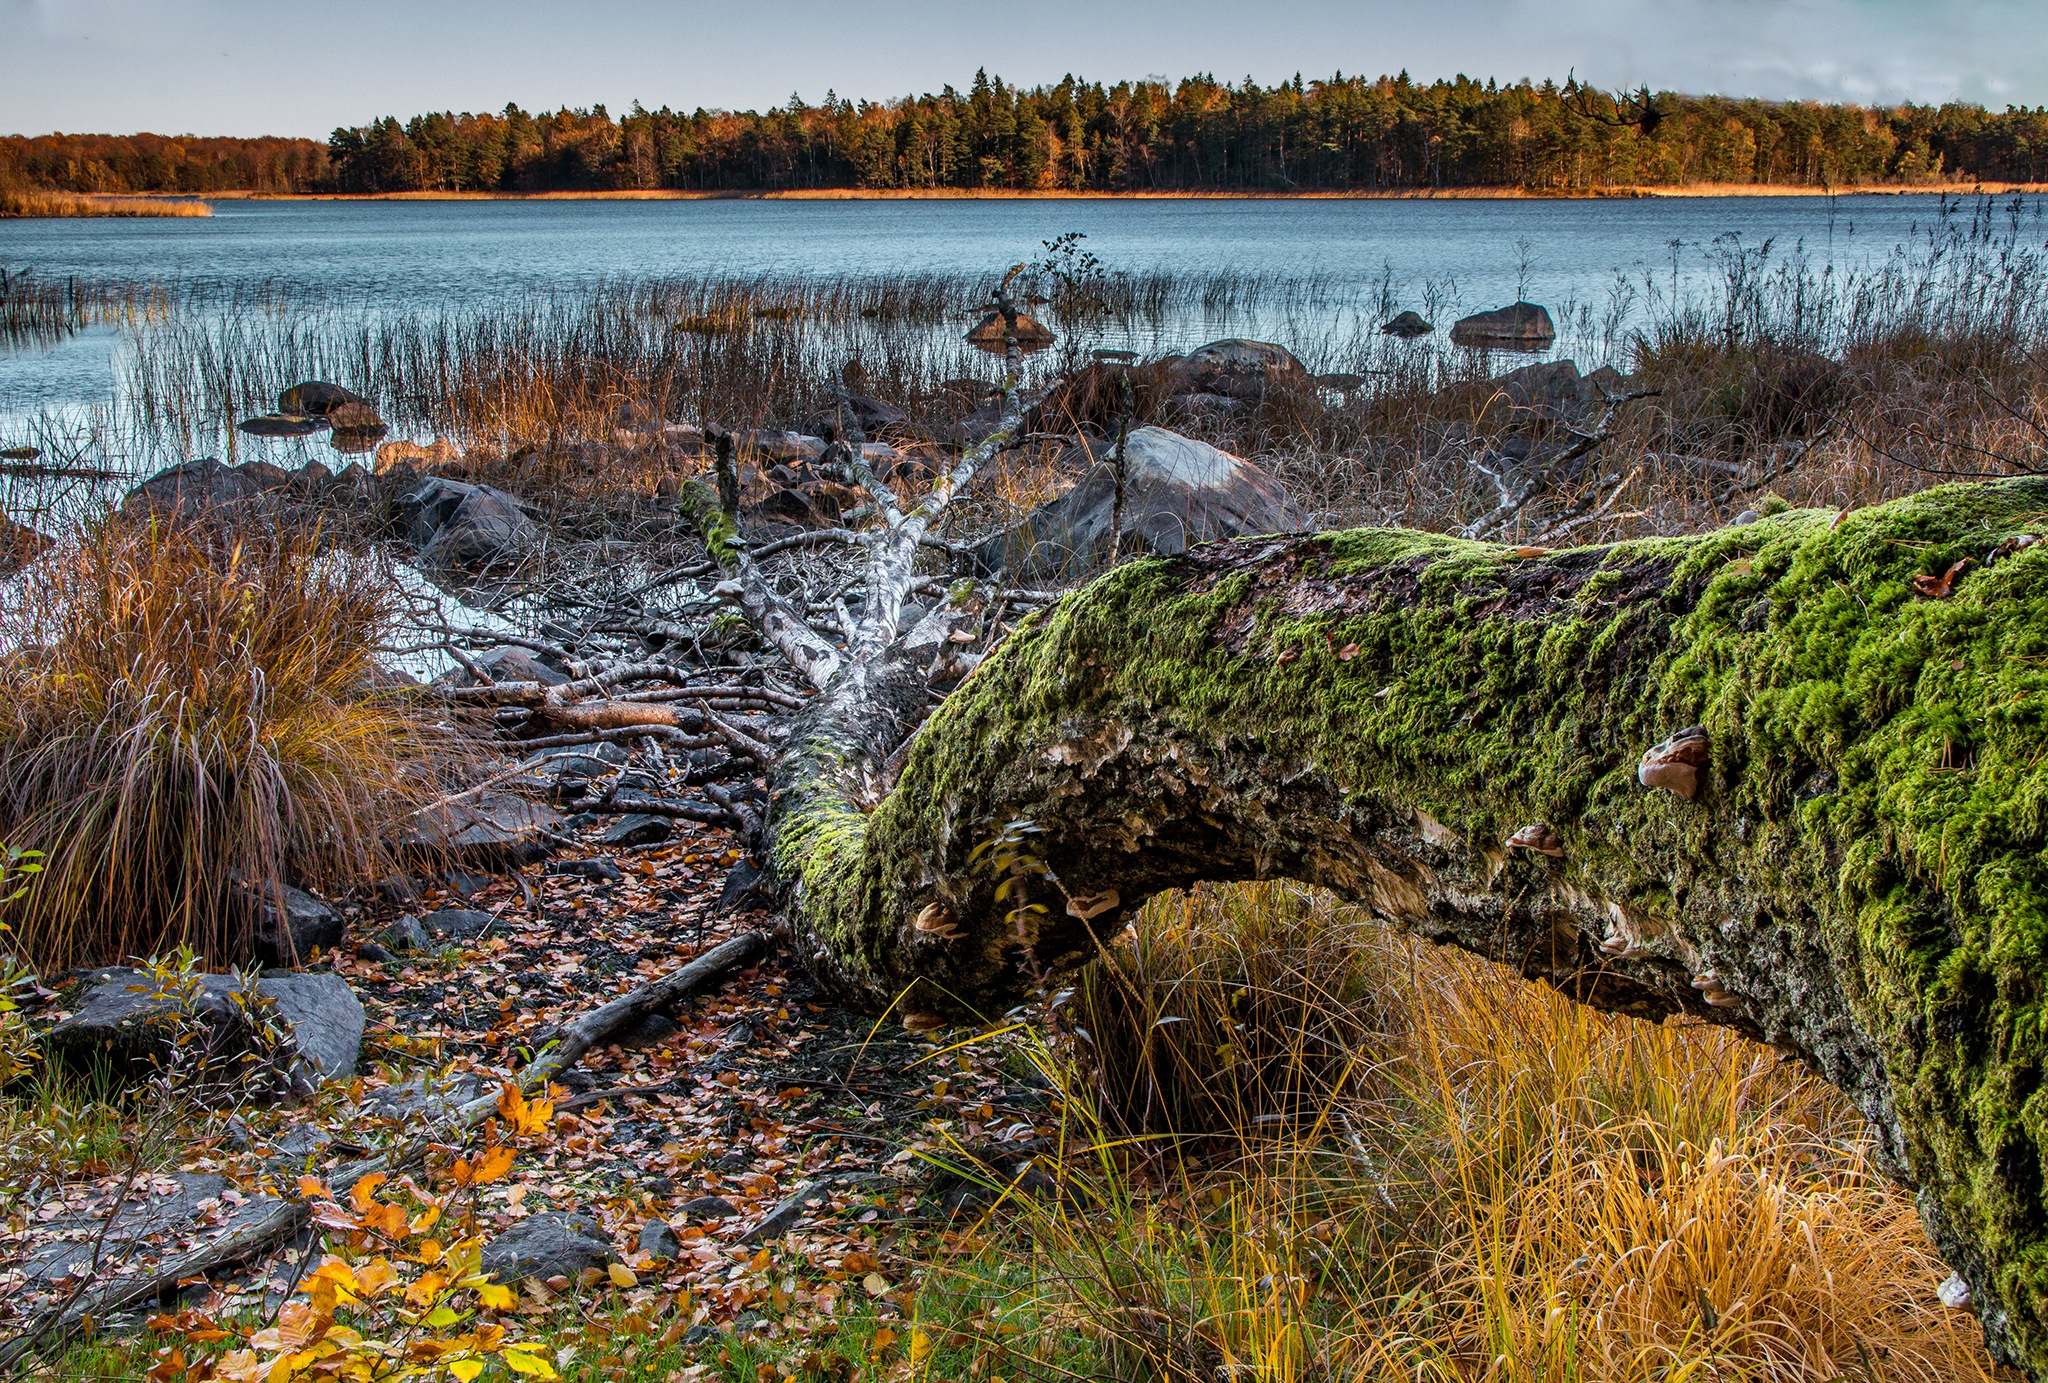 Lake view by elisah